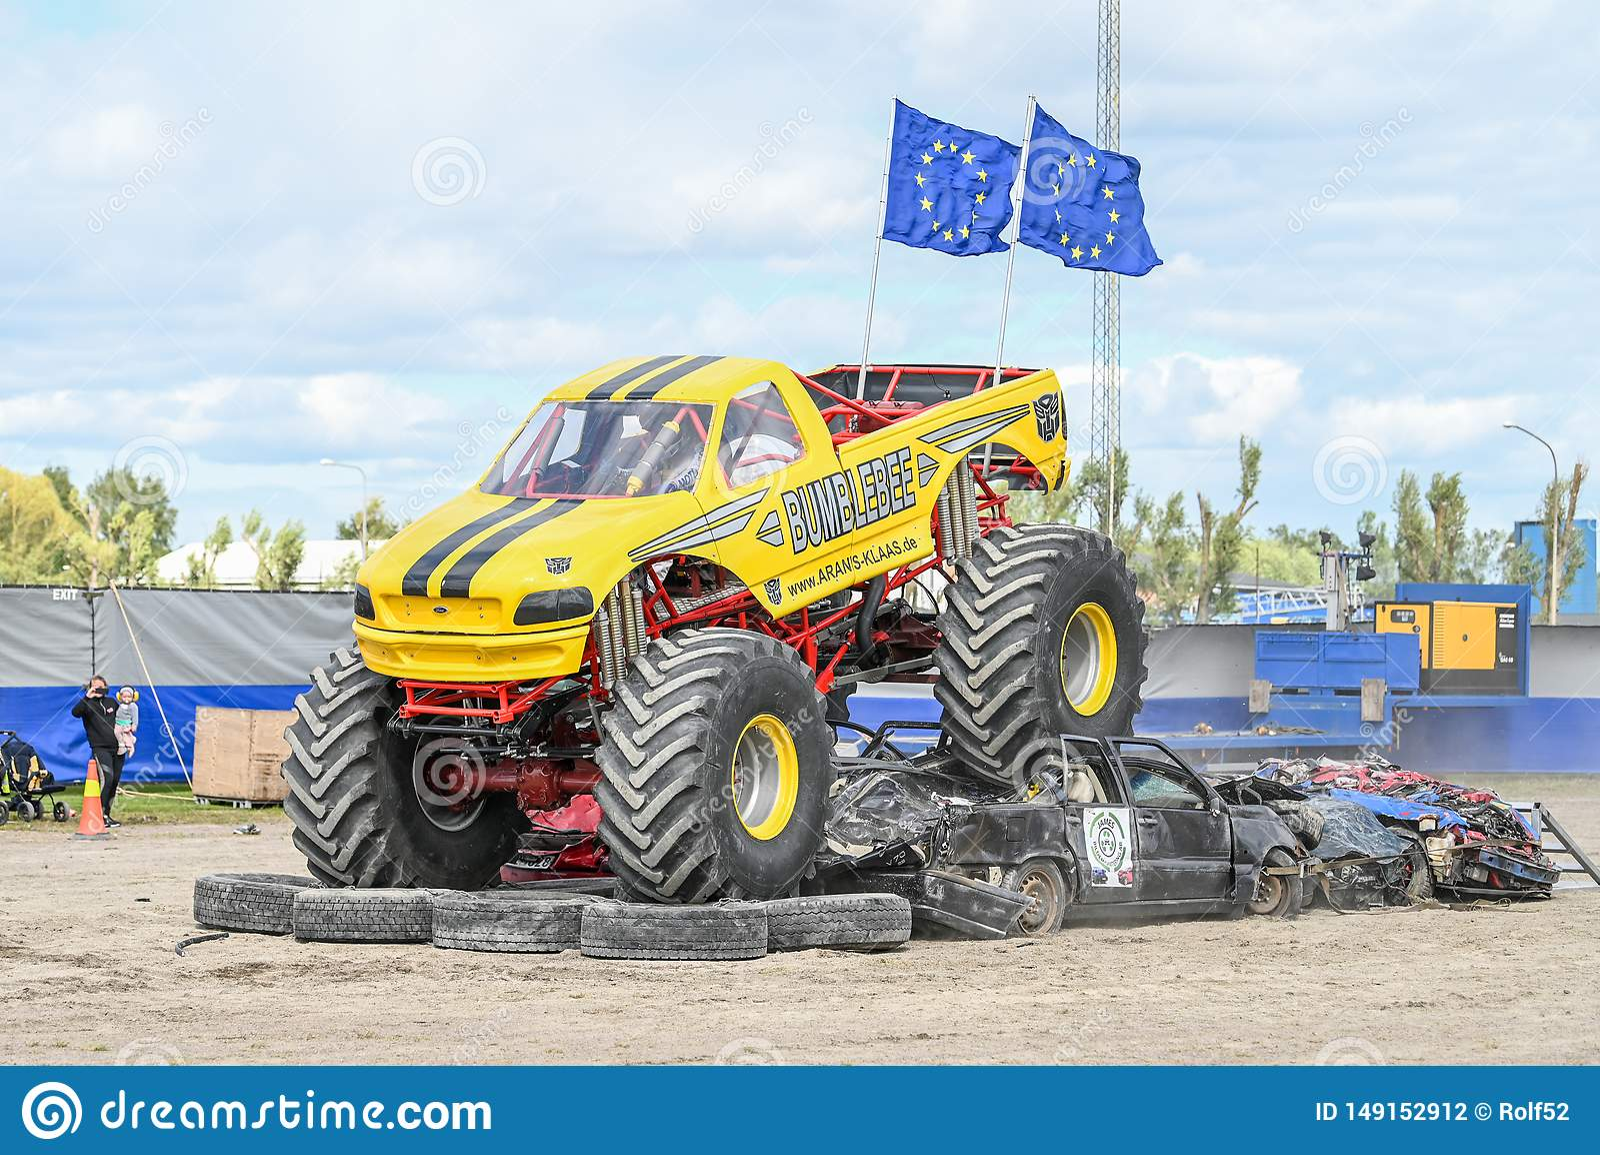 Mostra do monster truck